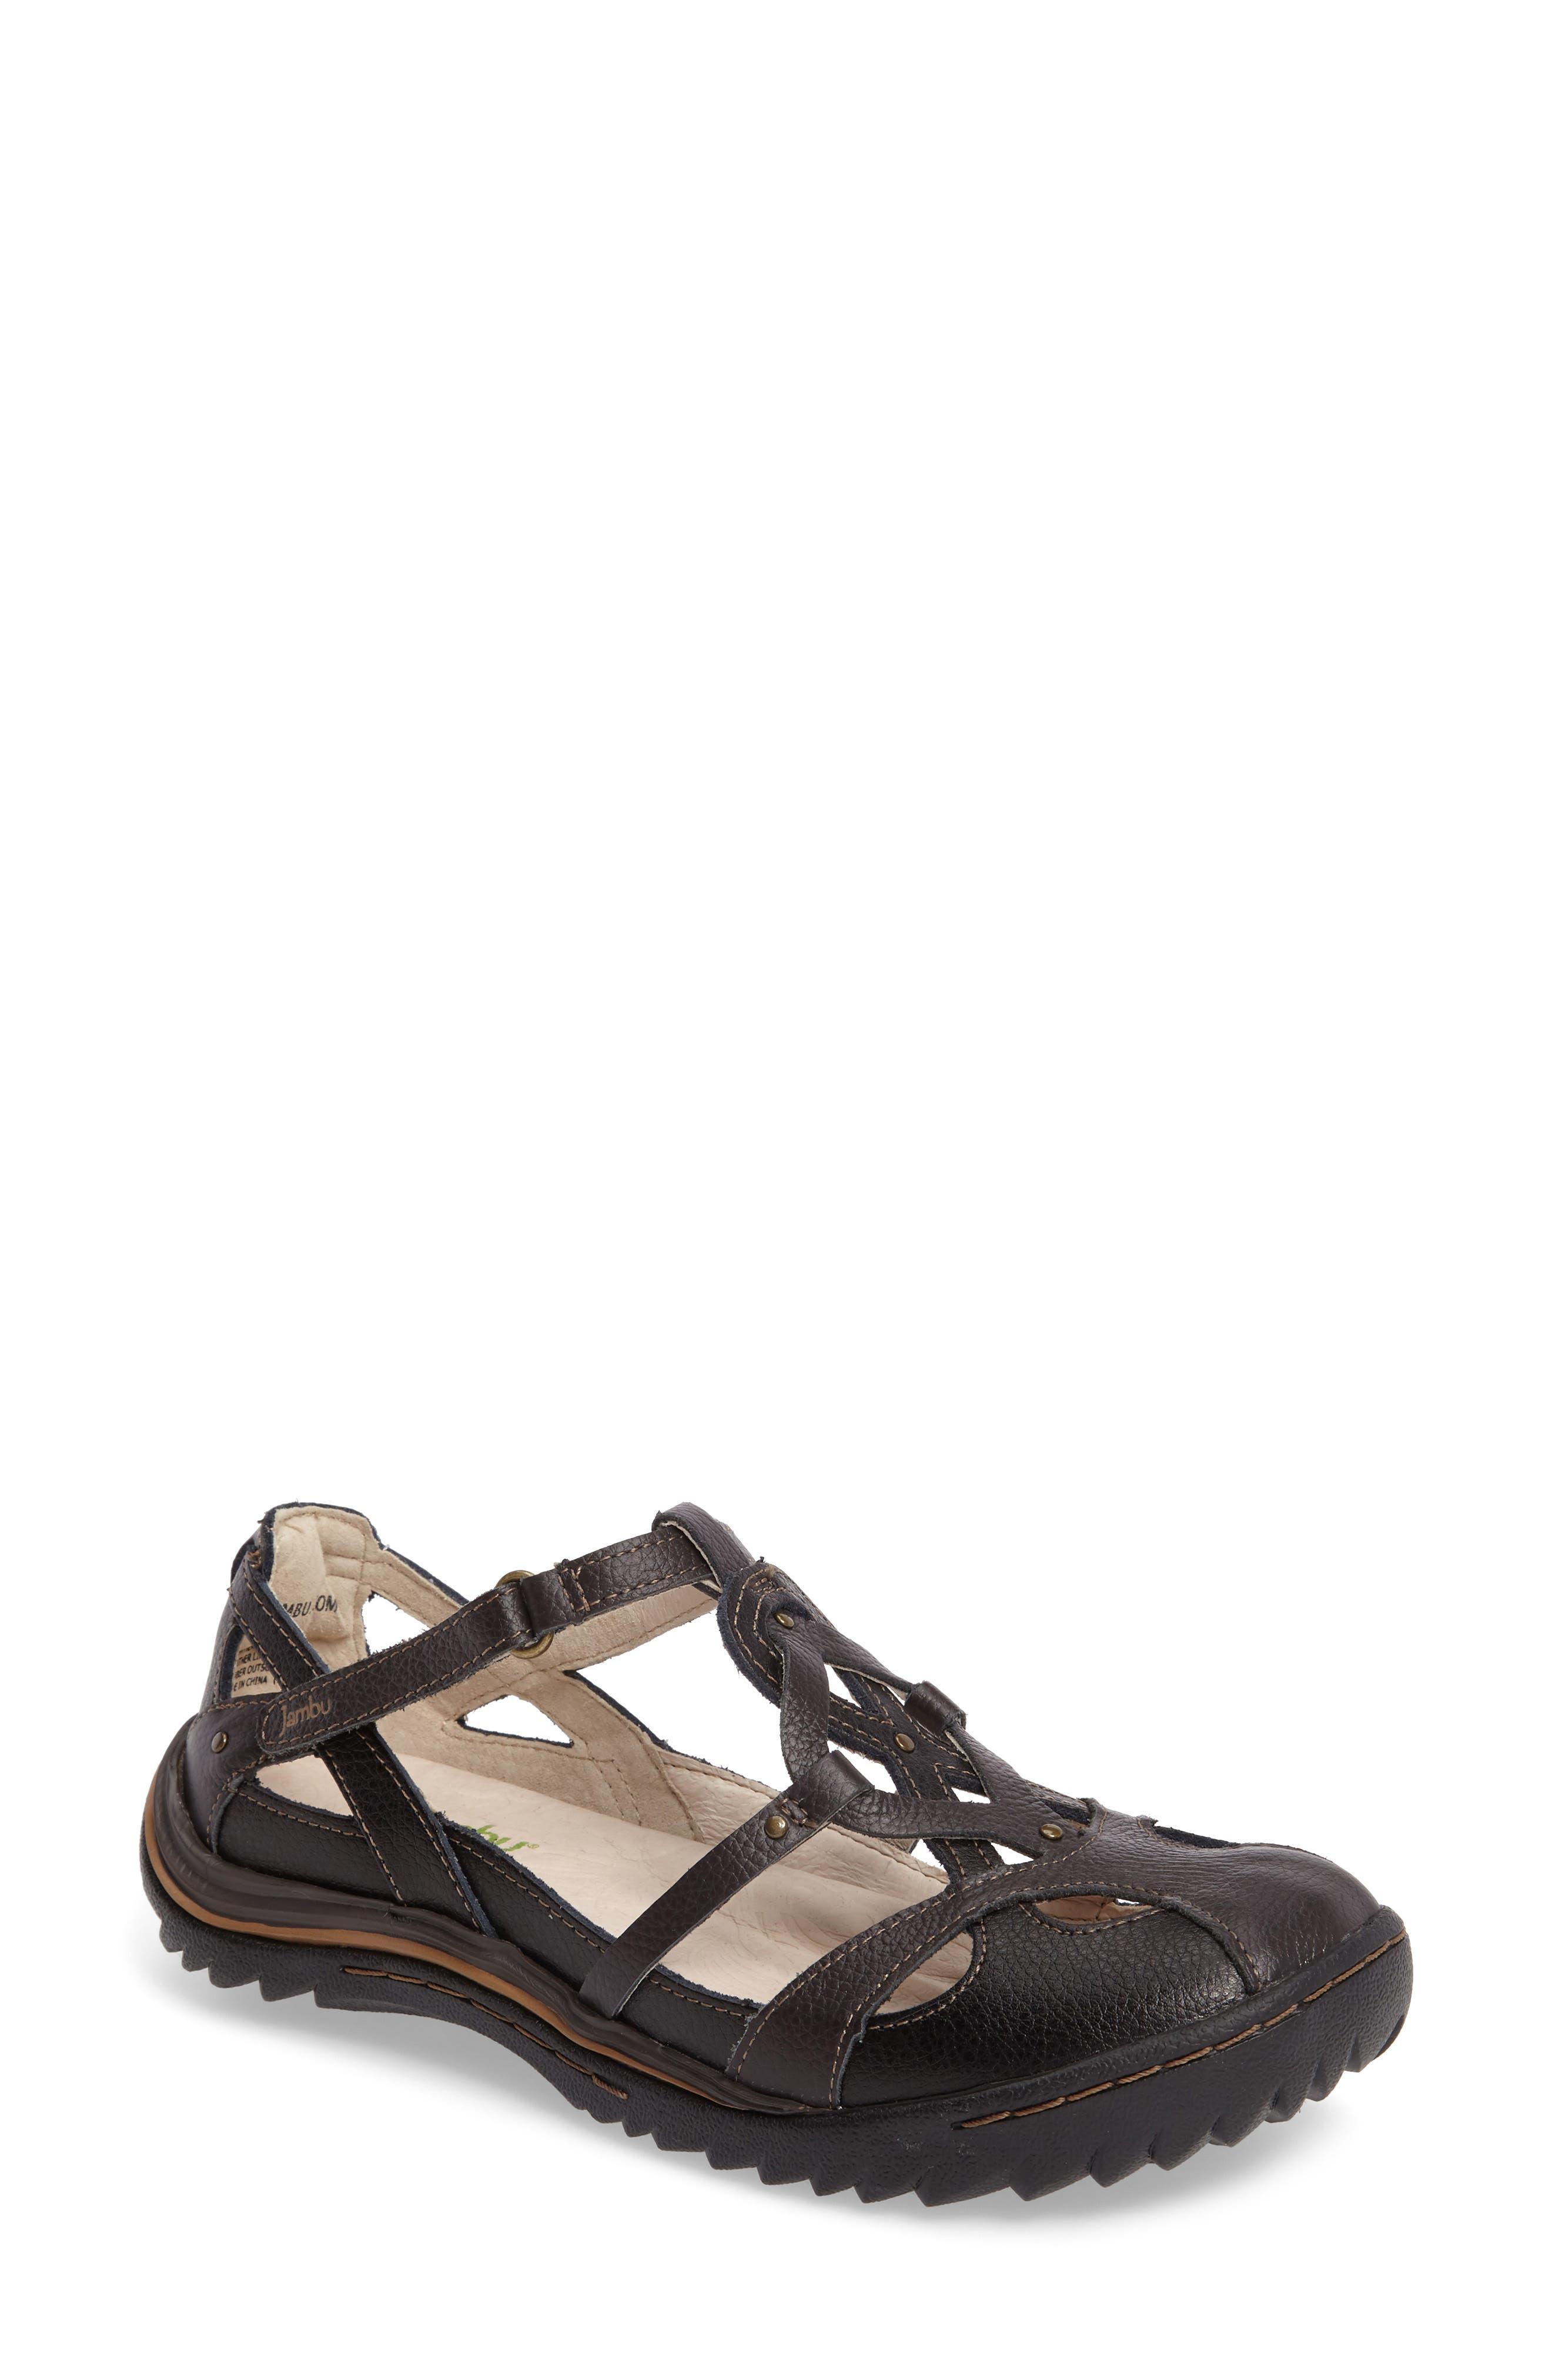 332ad44315e8 Women s Jambu Comfortable Shoes